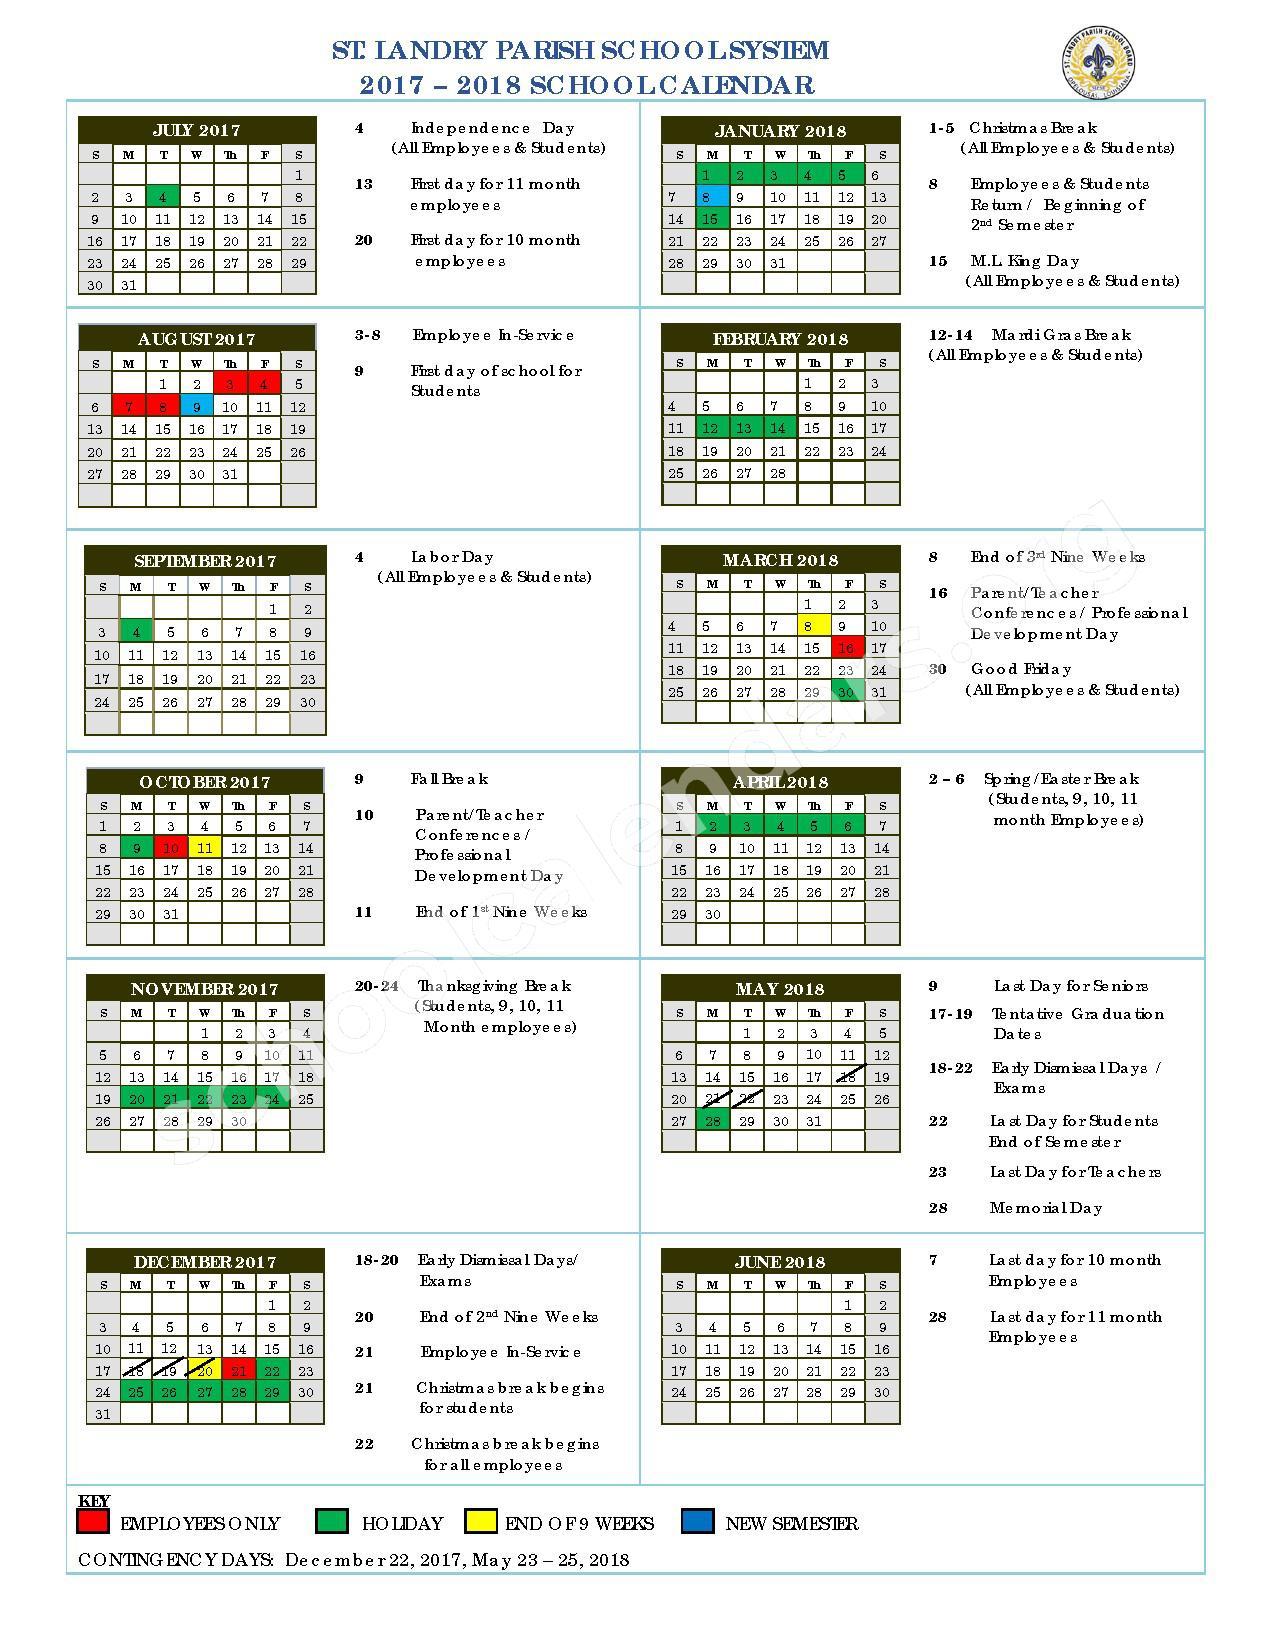 2017 - 2018 Academic Calendar – St. Landry Parish School Board – page 1